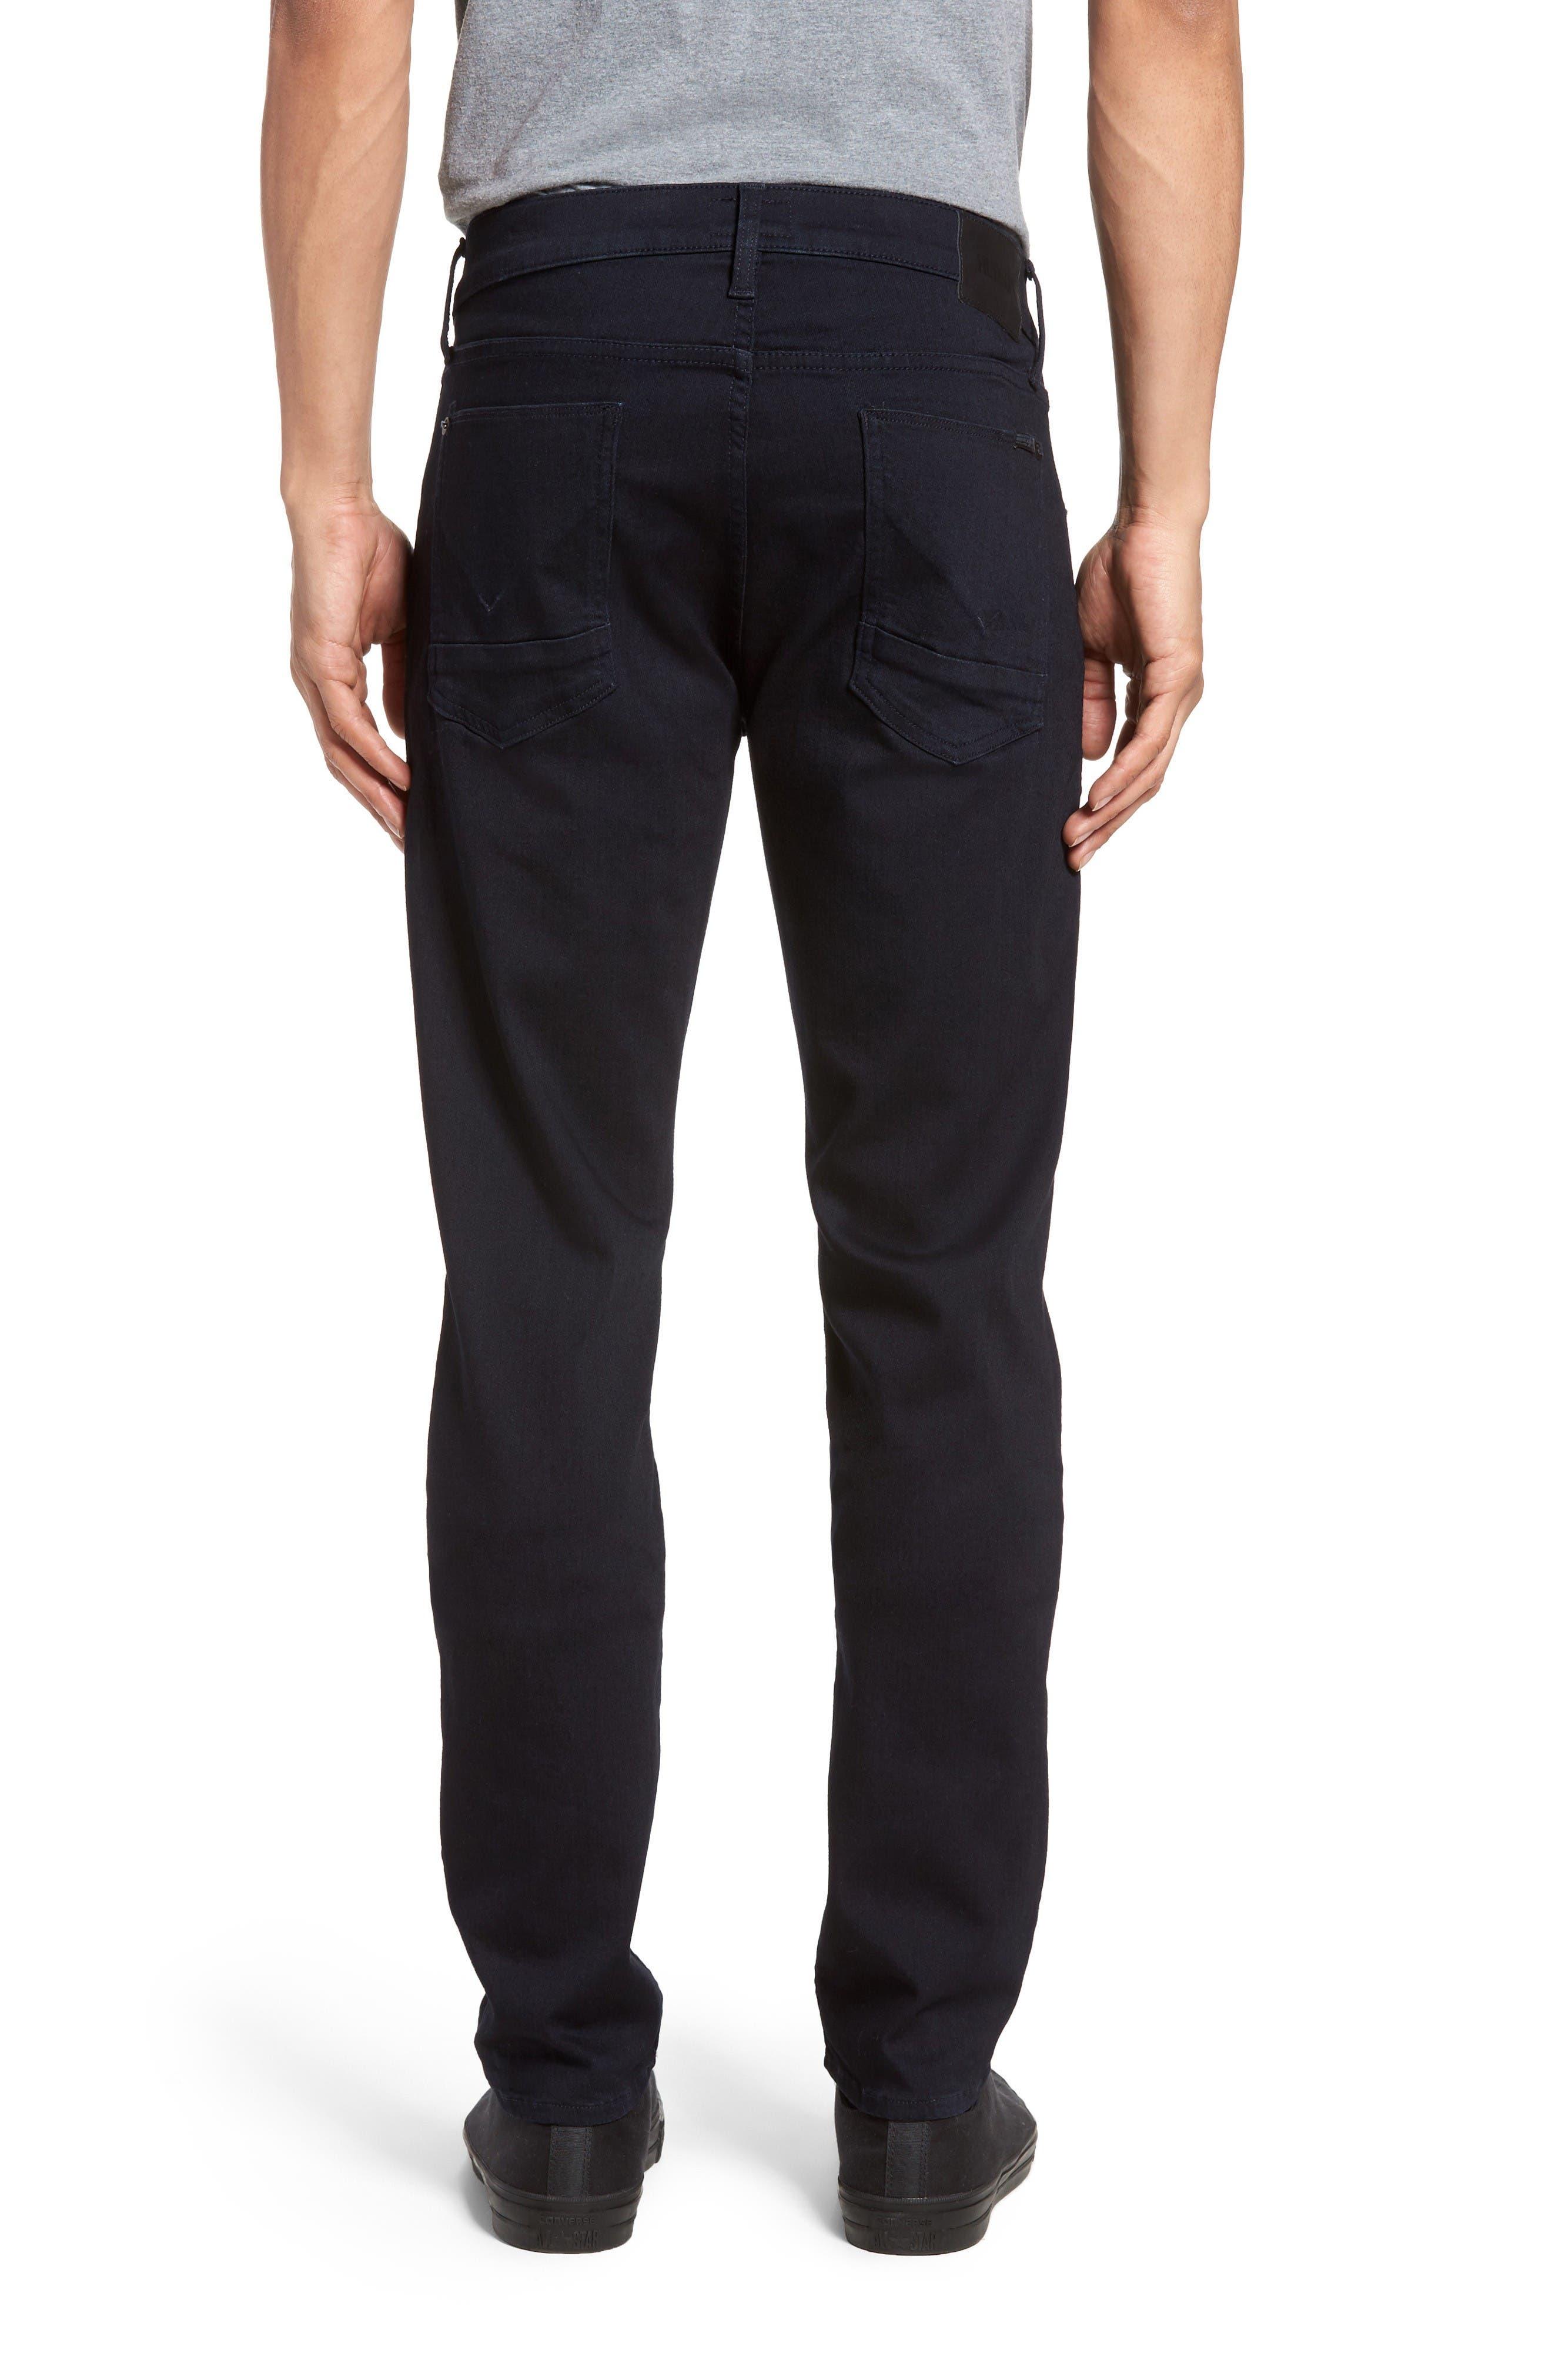 Blake Slim Fit Jeans,                             Alternate thumbnail 2, color,                             Hale Navy